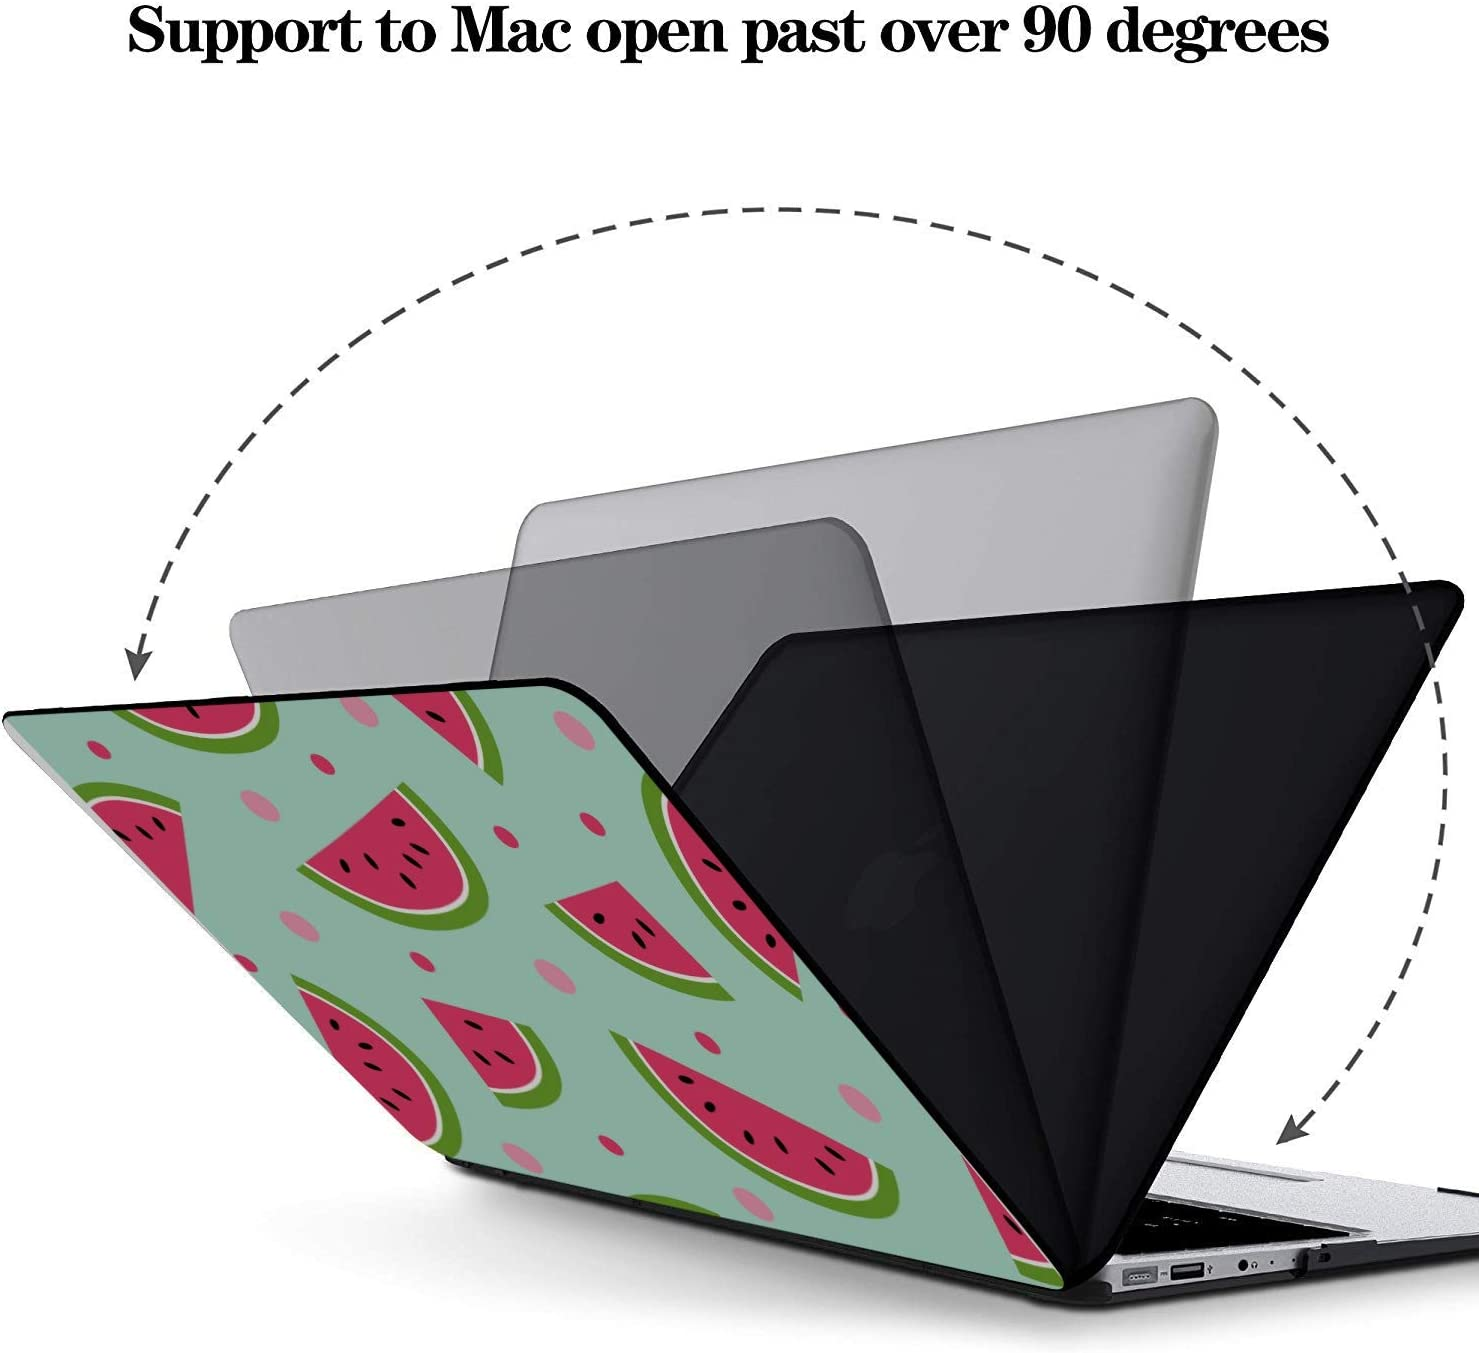 Protective MacBook Pro Case Summer Vintage Cute Fruit Watermelon Plastic Hard Shell Compatible Mac Air 11 Pro 13 15 Laptop Pro Accessories Protection for MacBook 2016-2019 Version